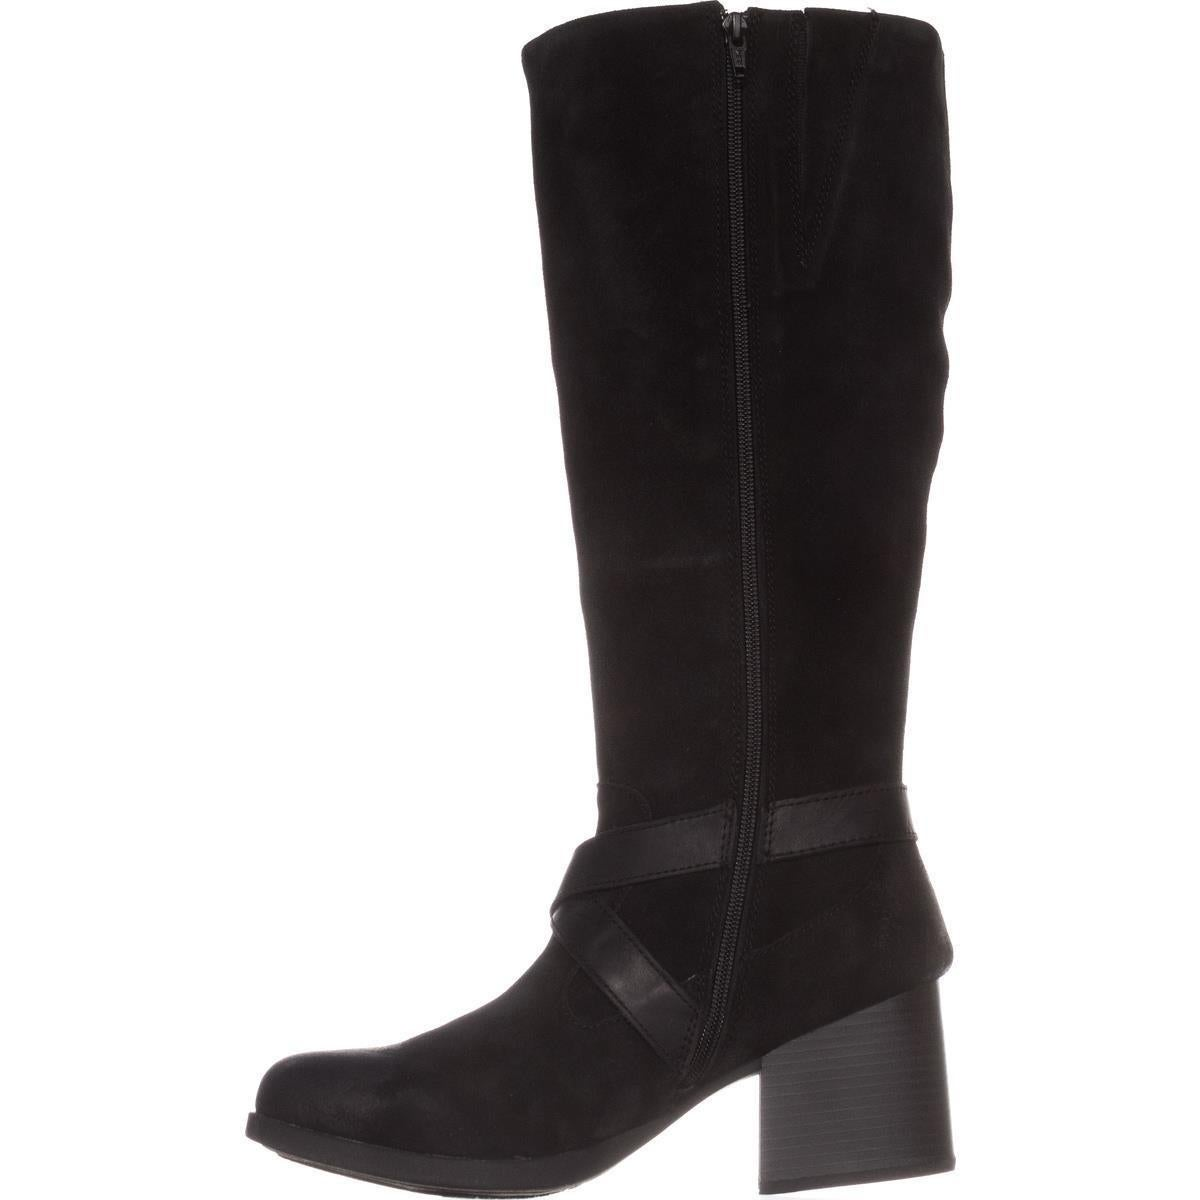 7d2c44f24ca Born Women s Shoes